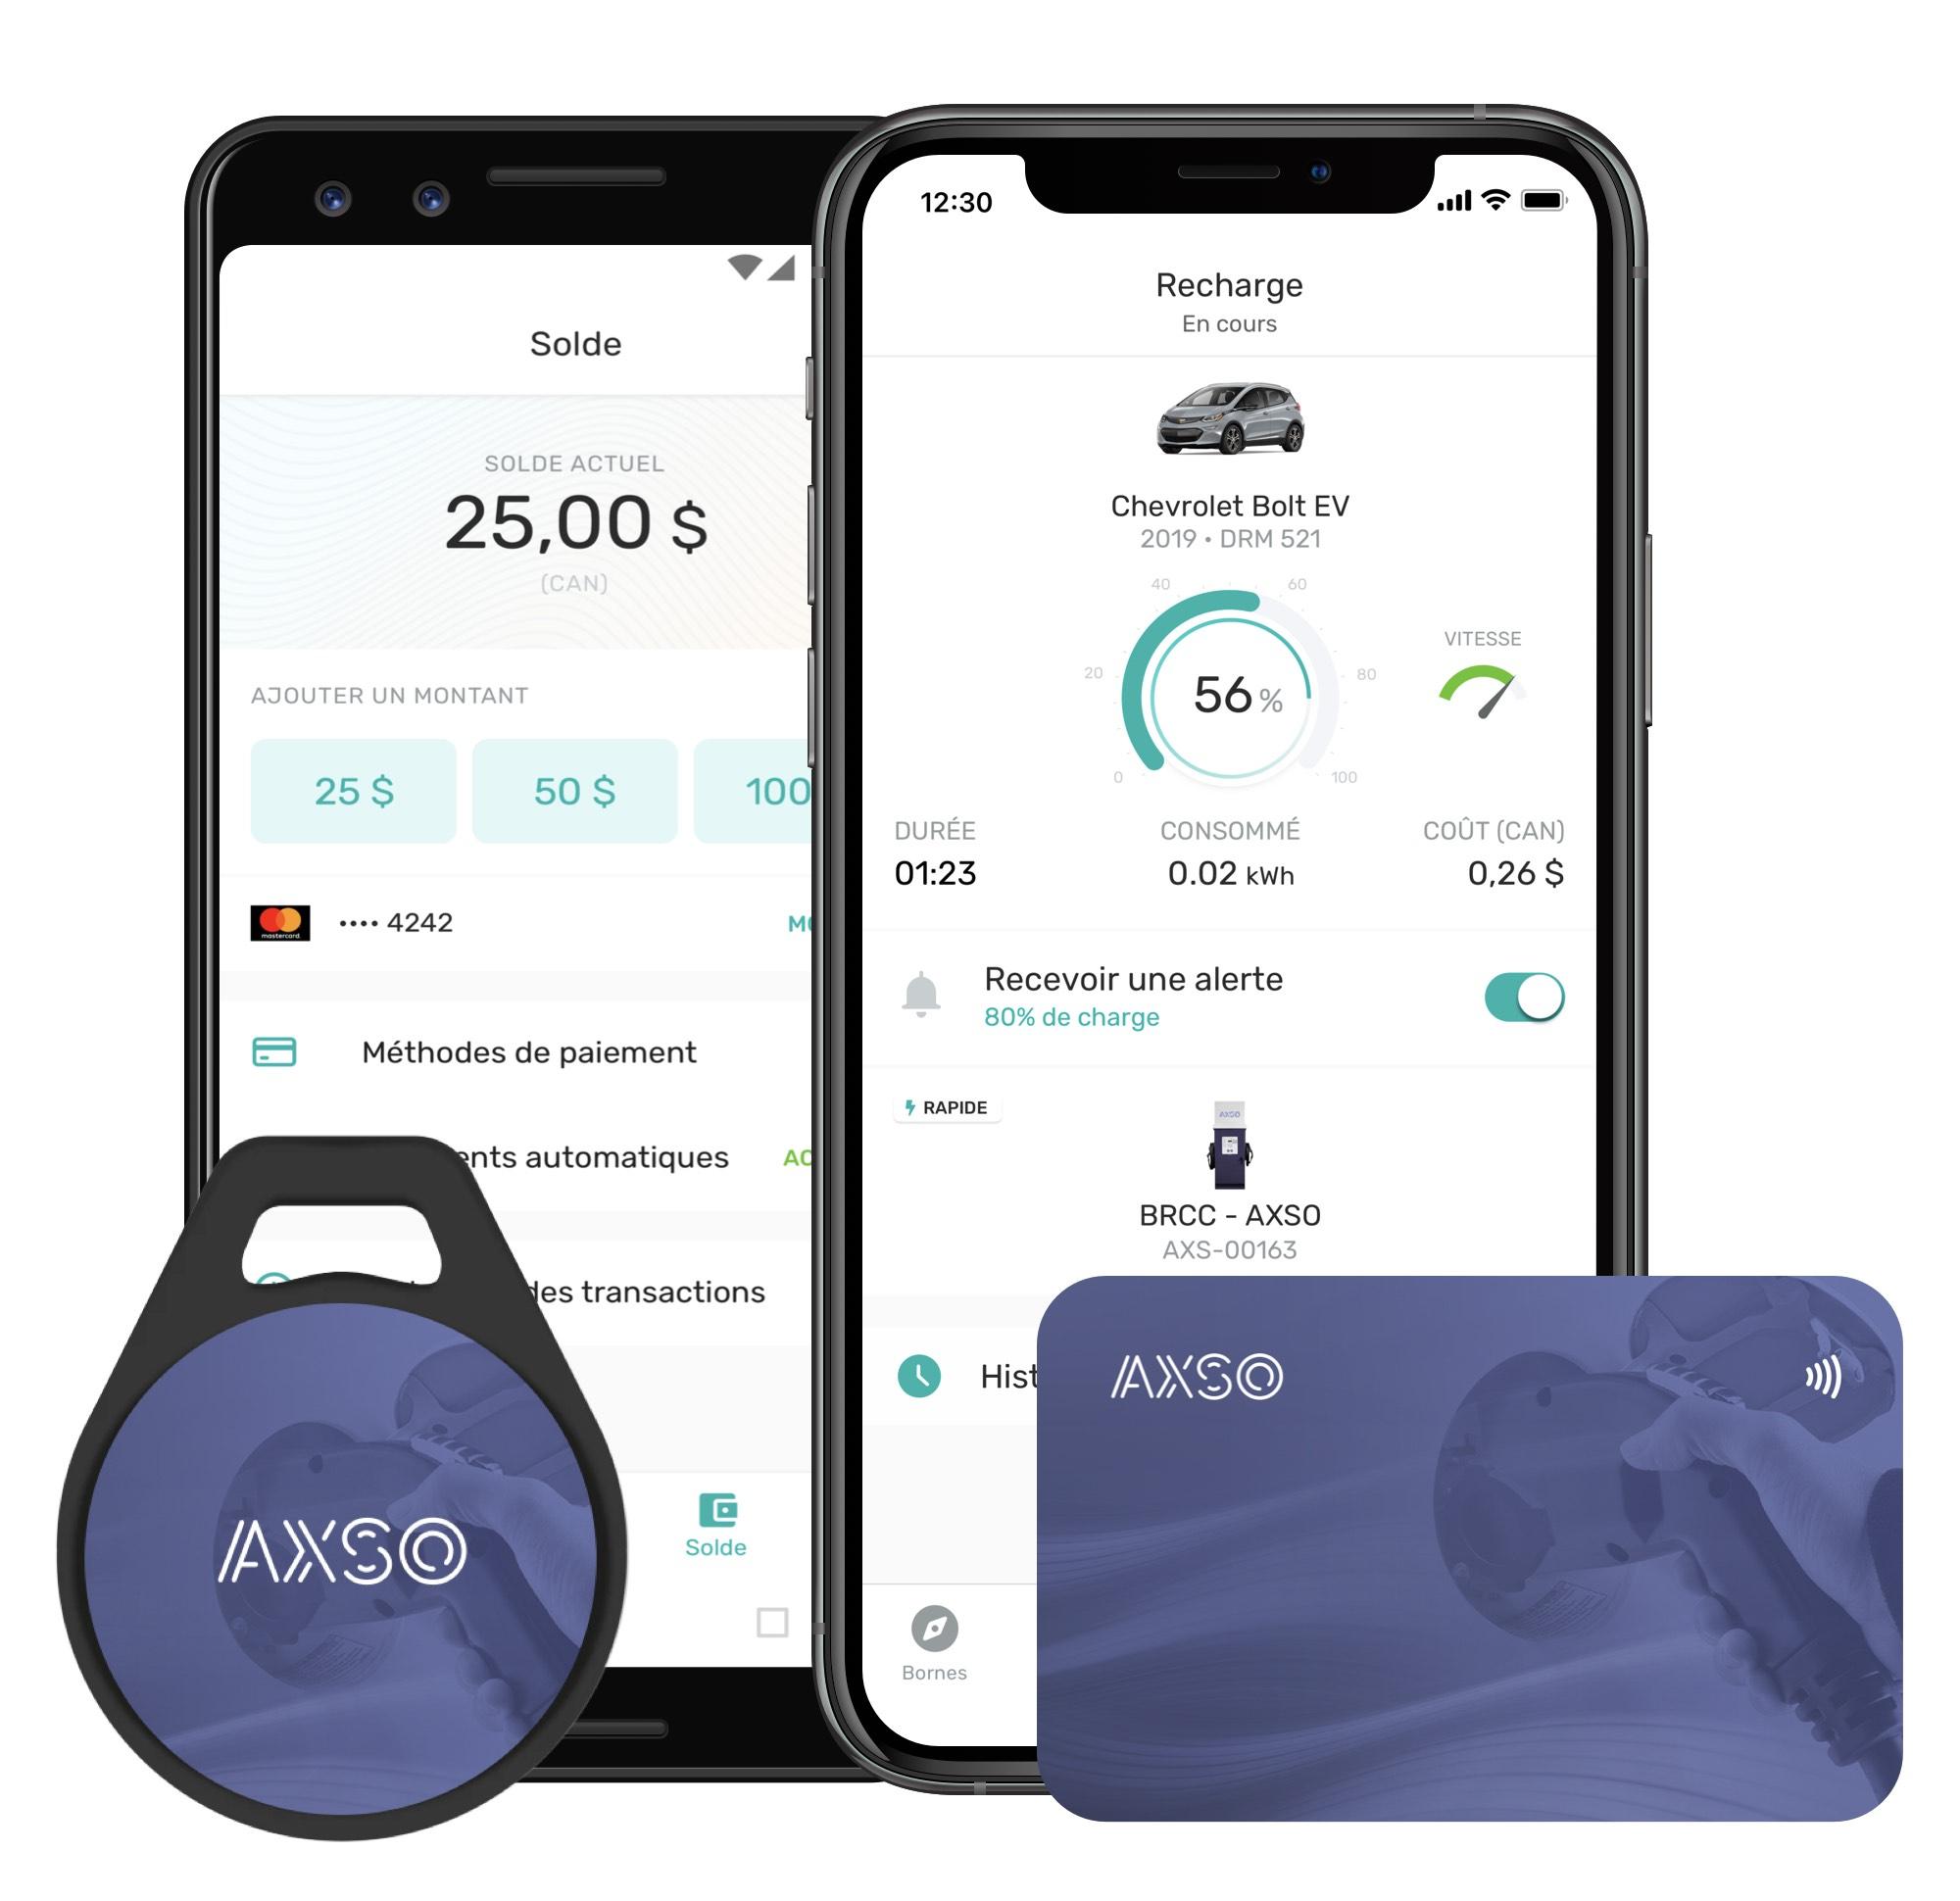 AXSO Platform screenshot for paying and charging